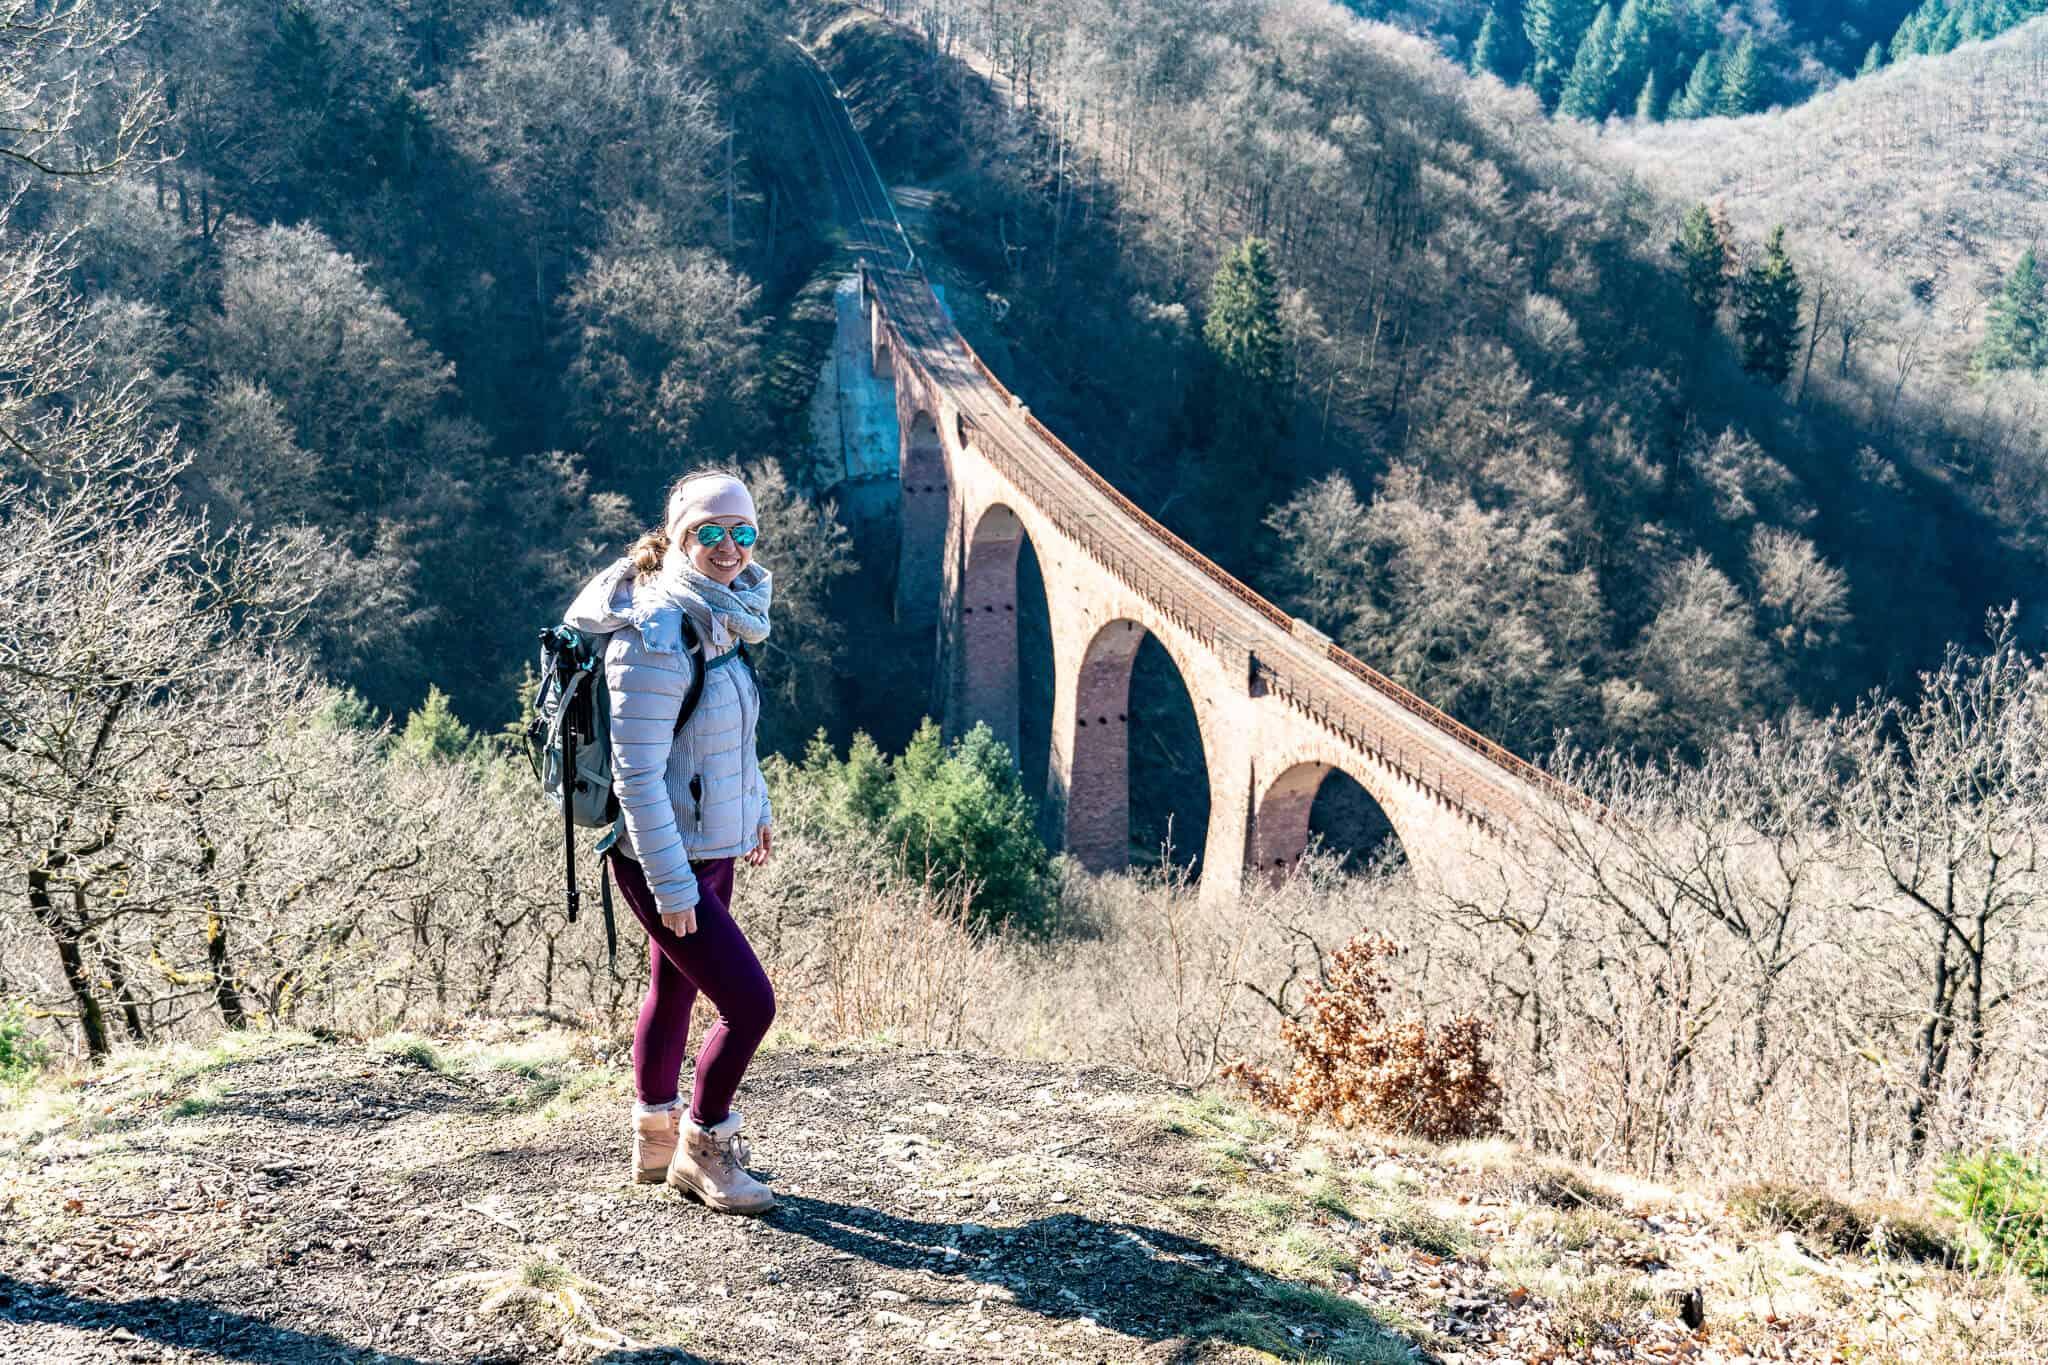 Barbara am Hubertusviadukt Traumschleife Elfenlay